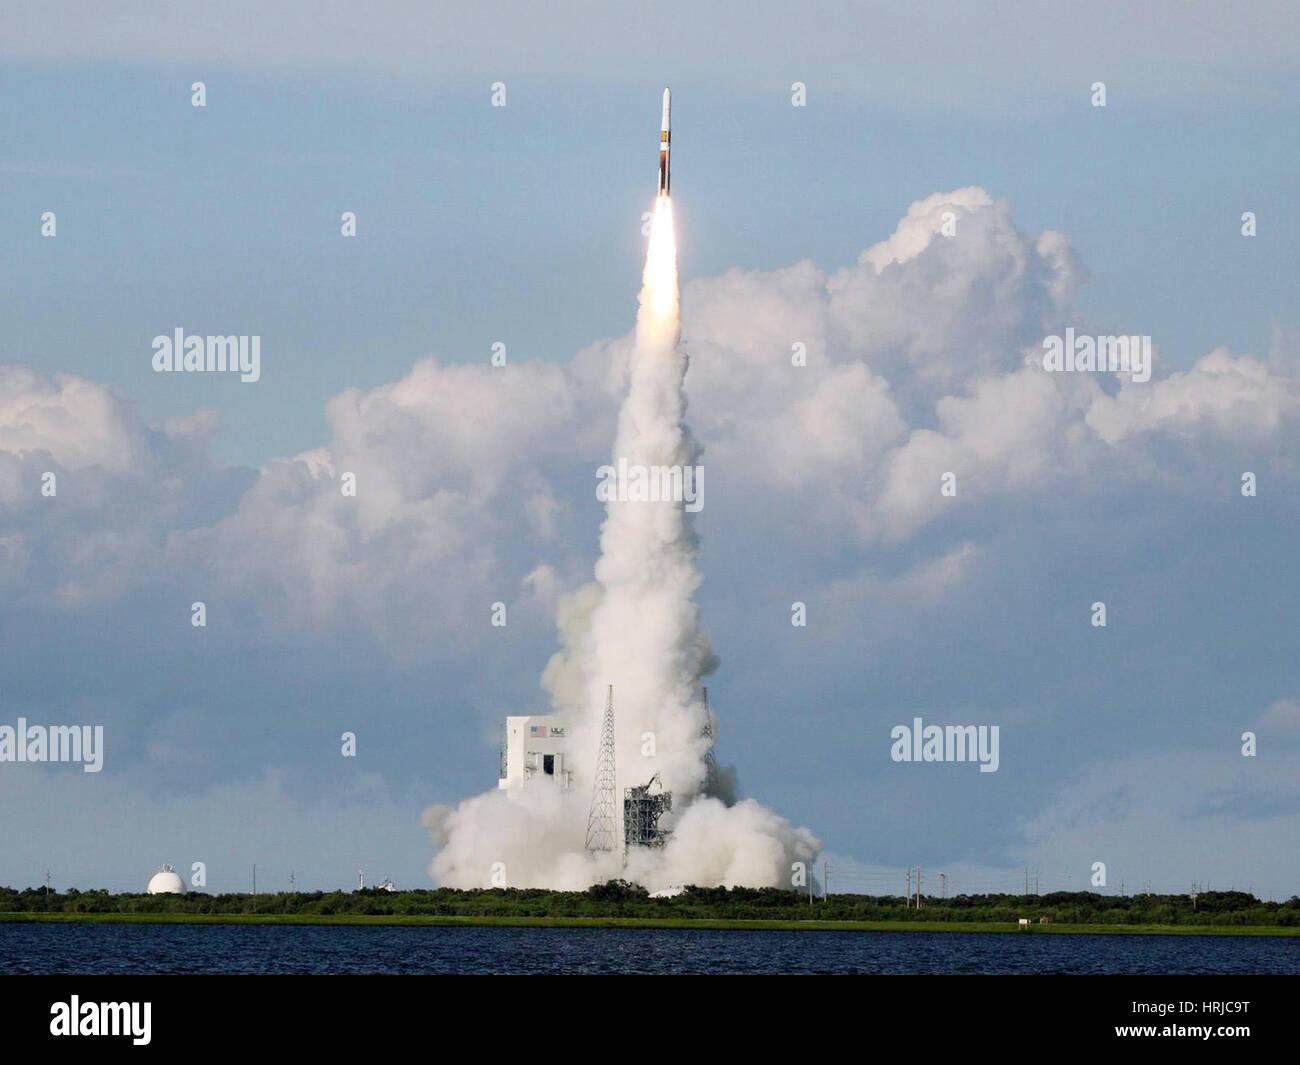 Delta IV Rocket Taking Off - Stock Image